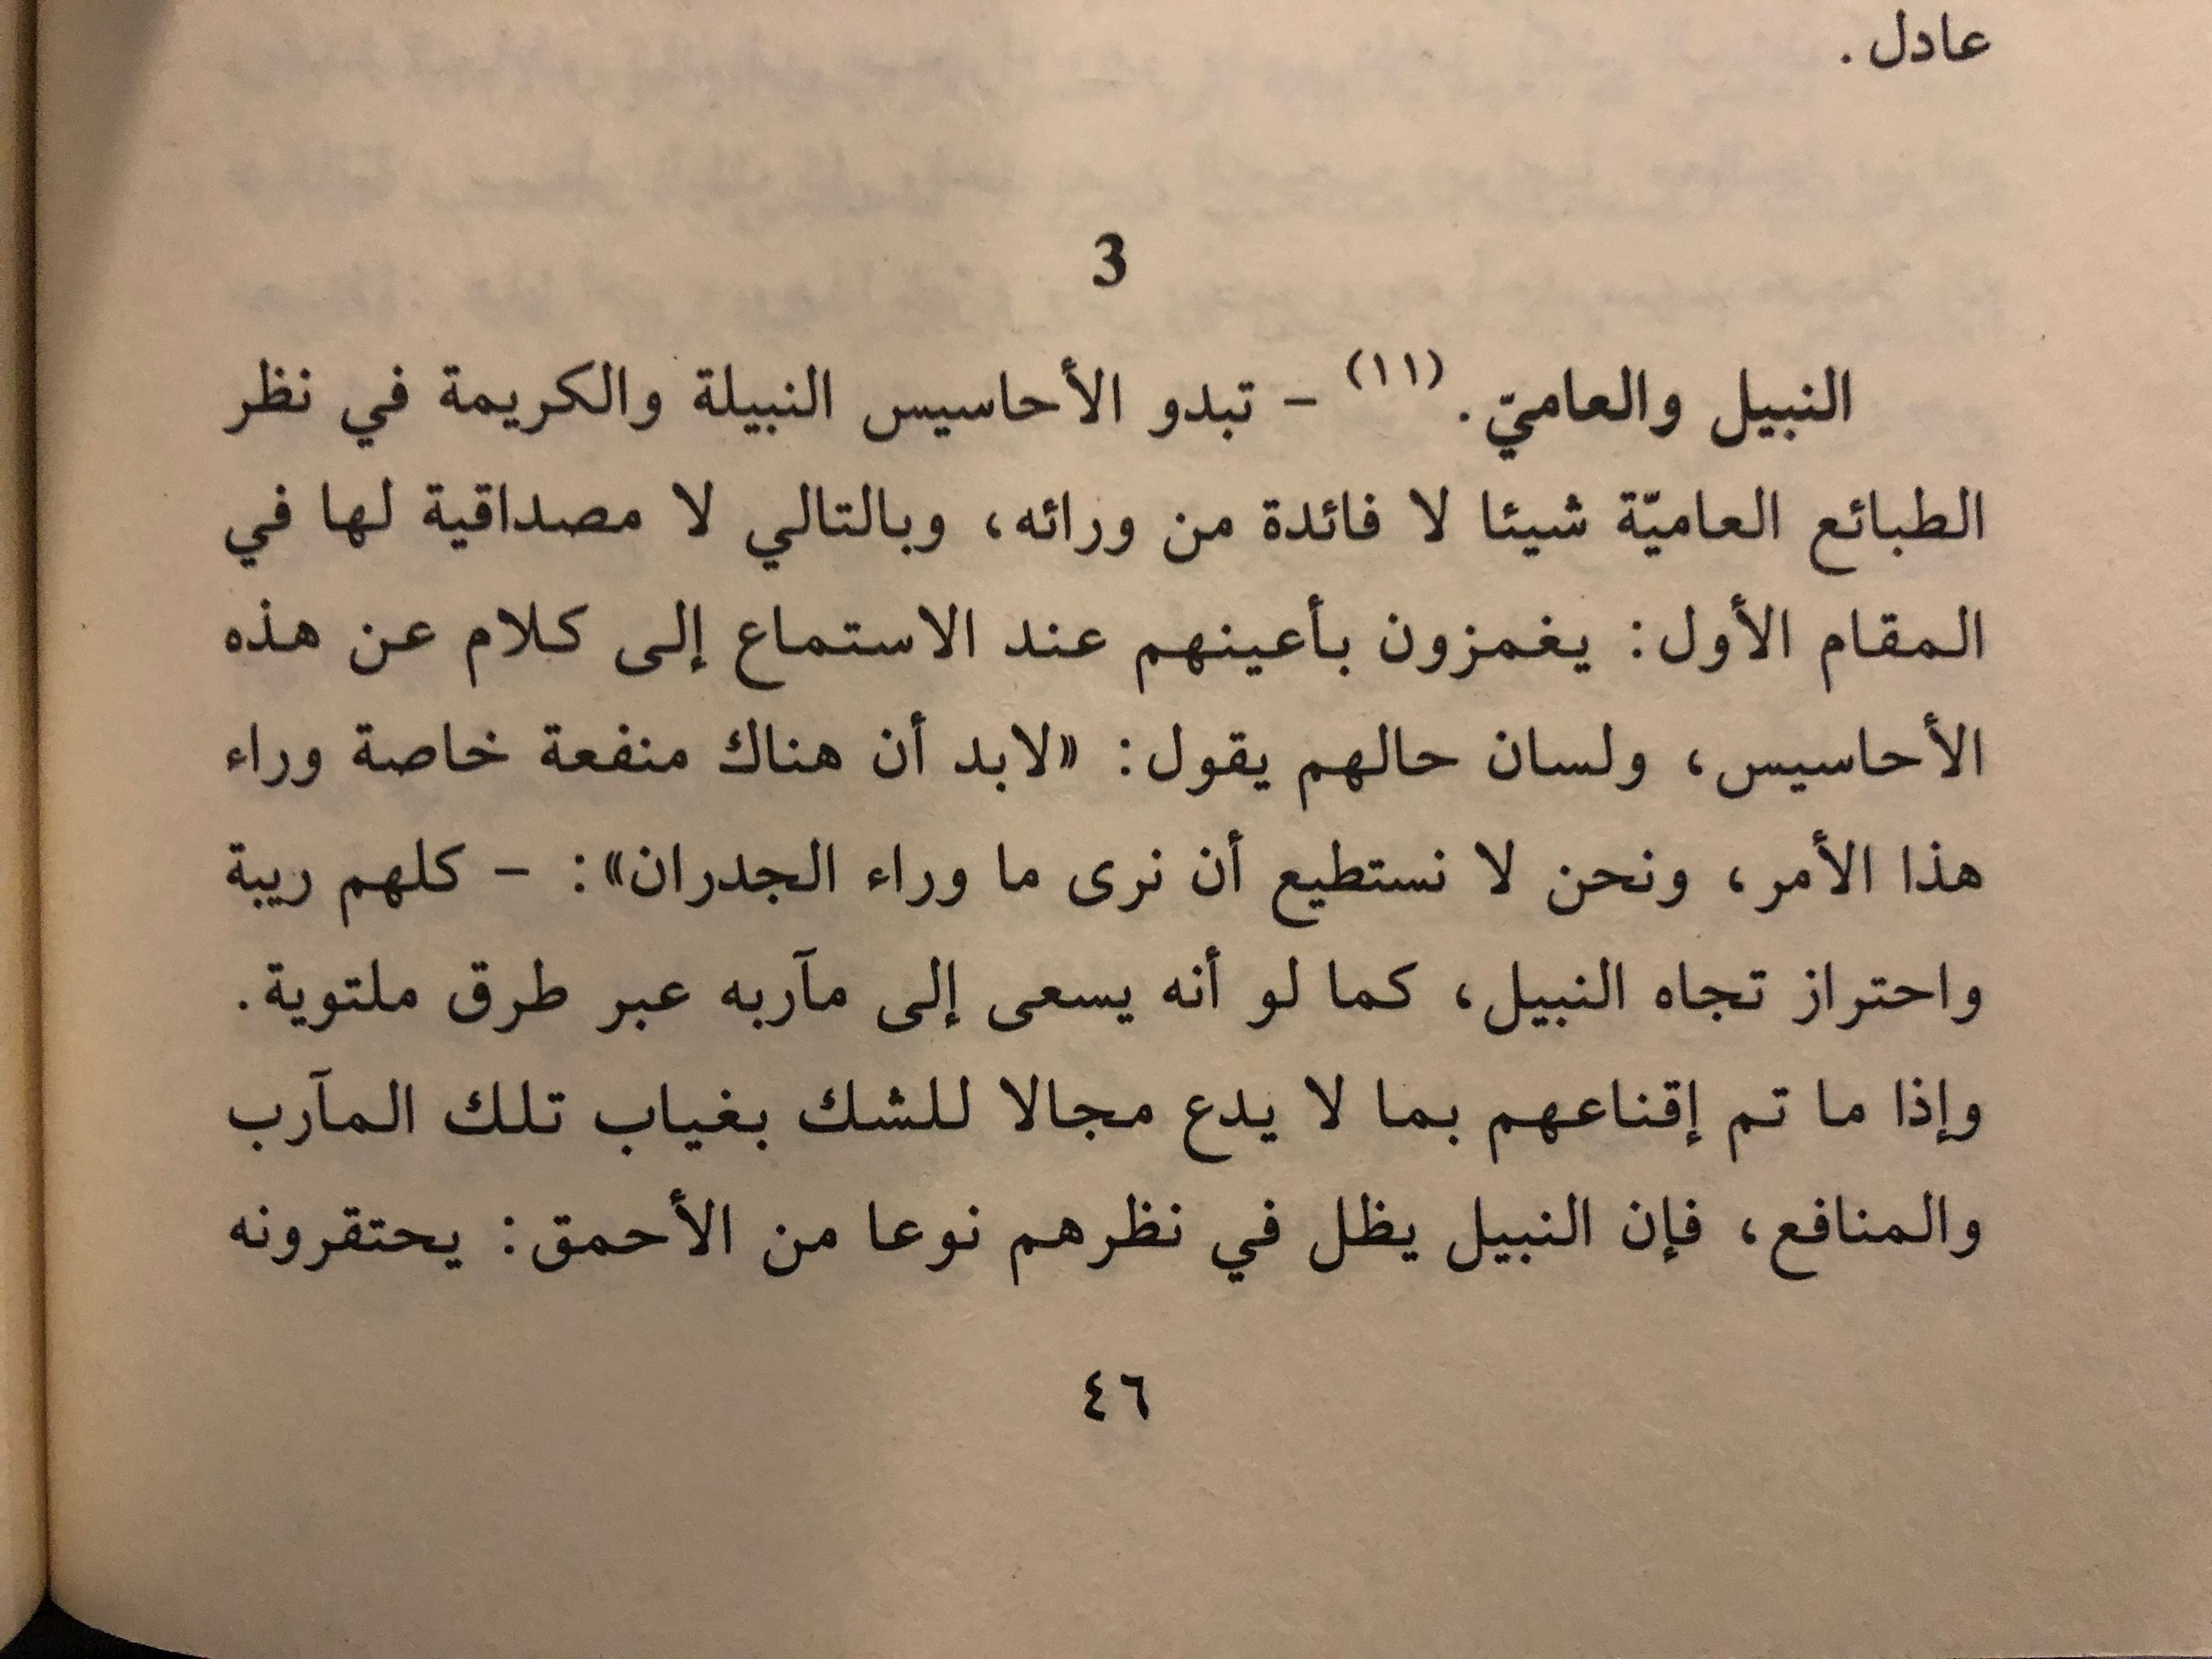 فريدريك نيتشه Arabic Words Words Arabic Calligraphy